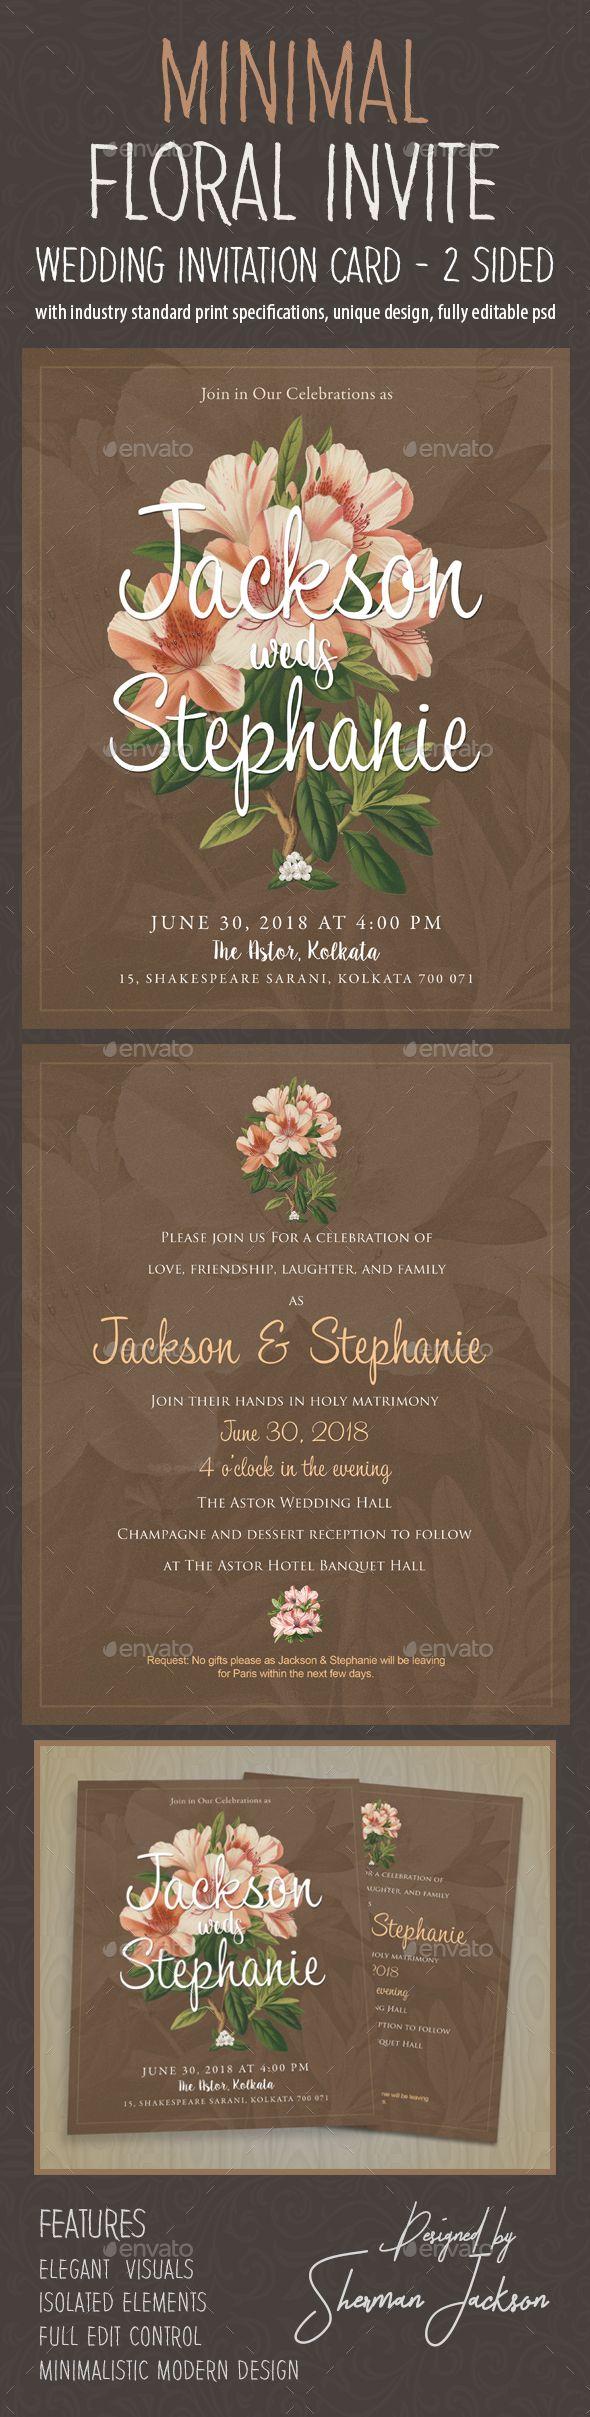 wildflower wedding invitation templates%0A event management proposal sample